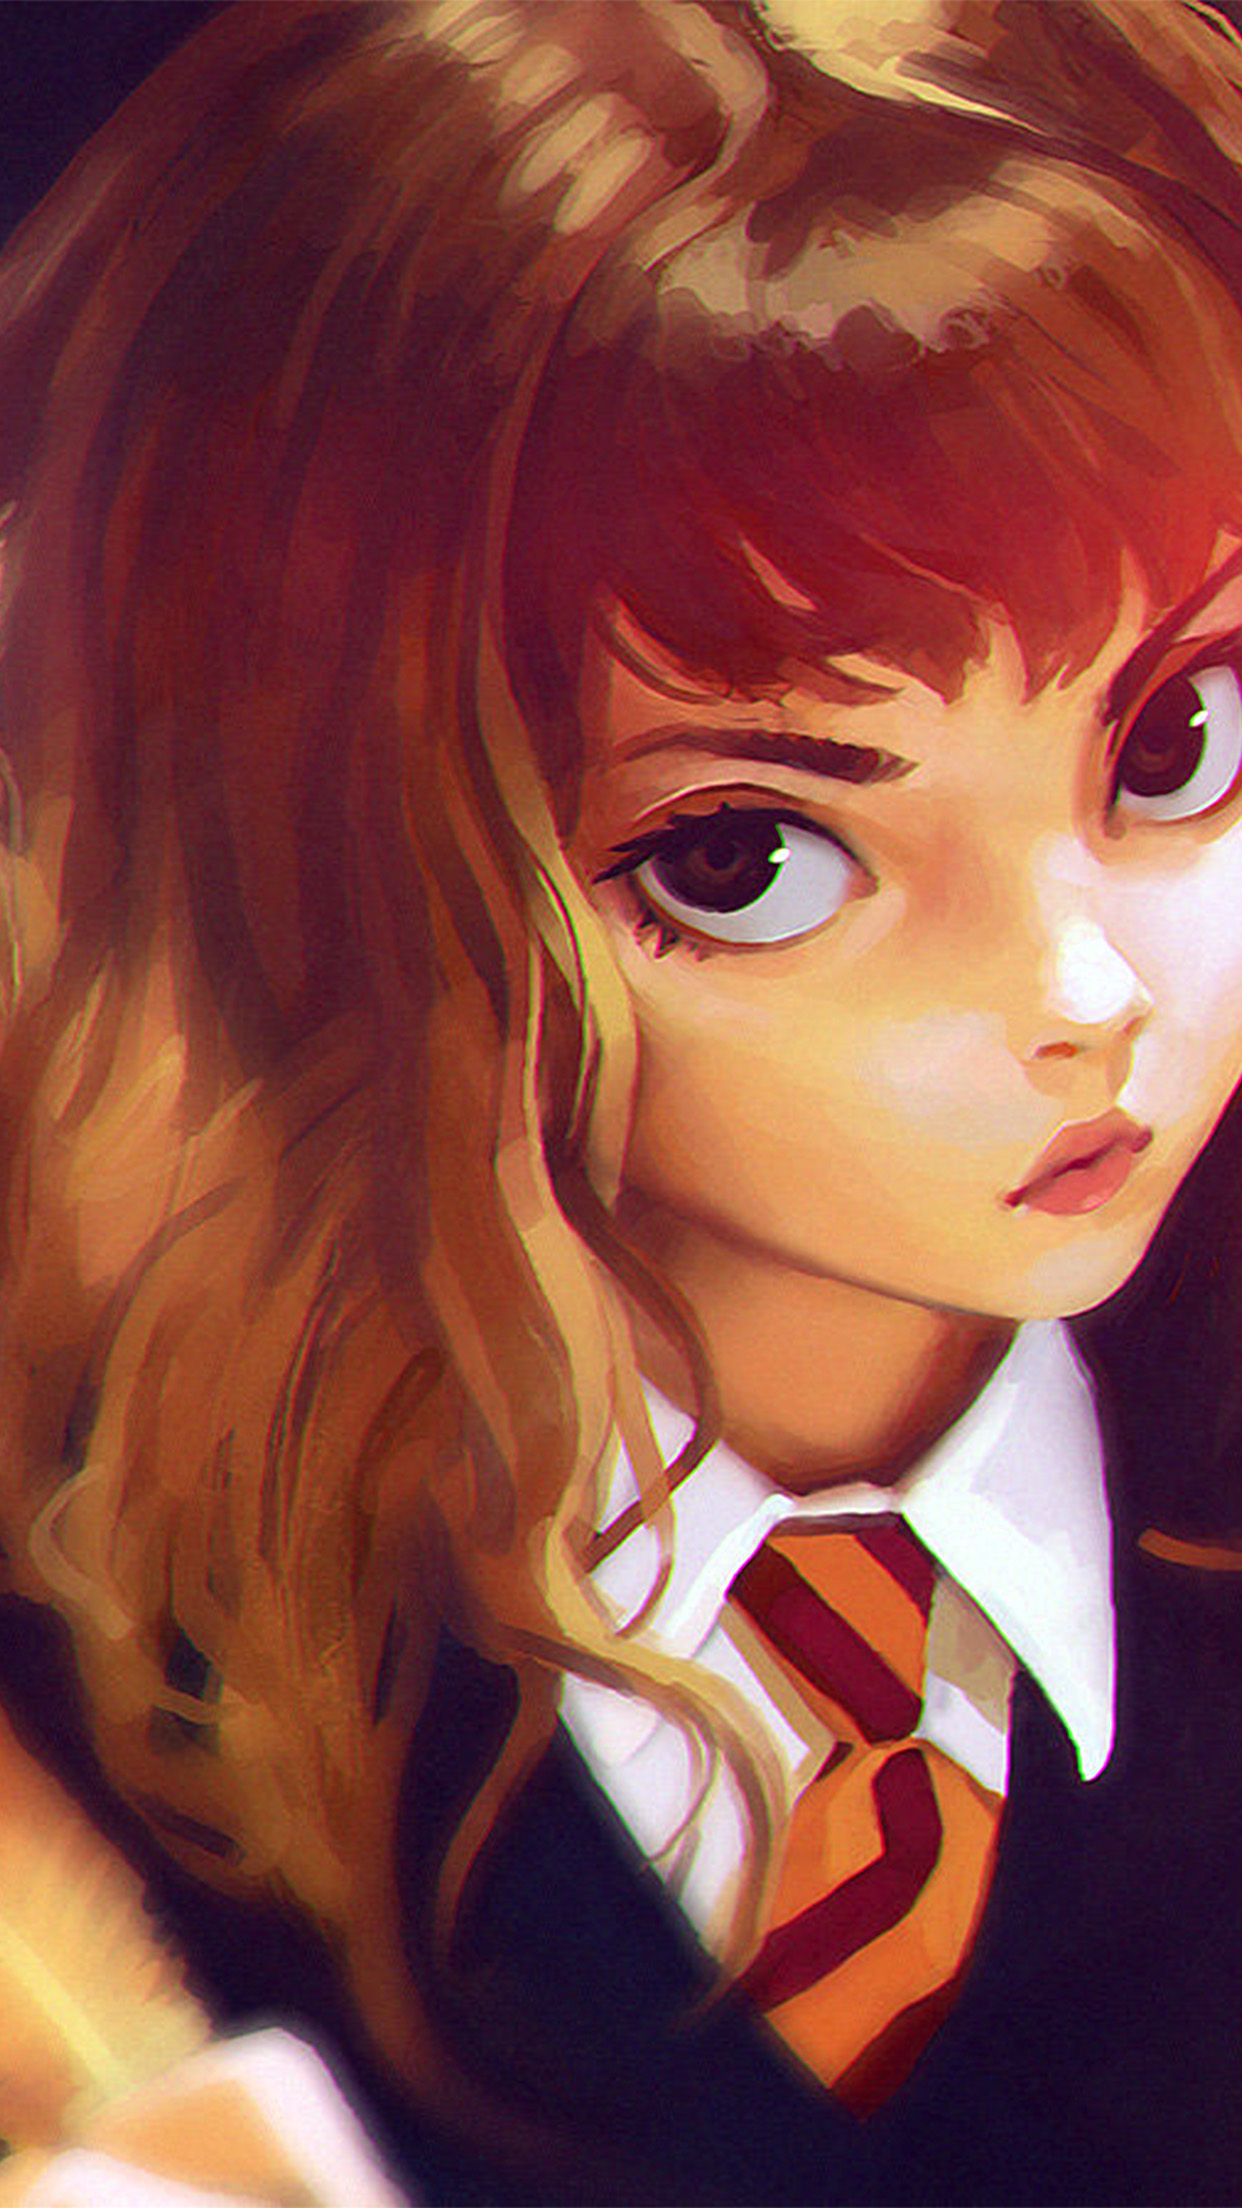 Harry Potter Cartoon Wallpaper Hd , HD Wallpaper & Backgrounds